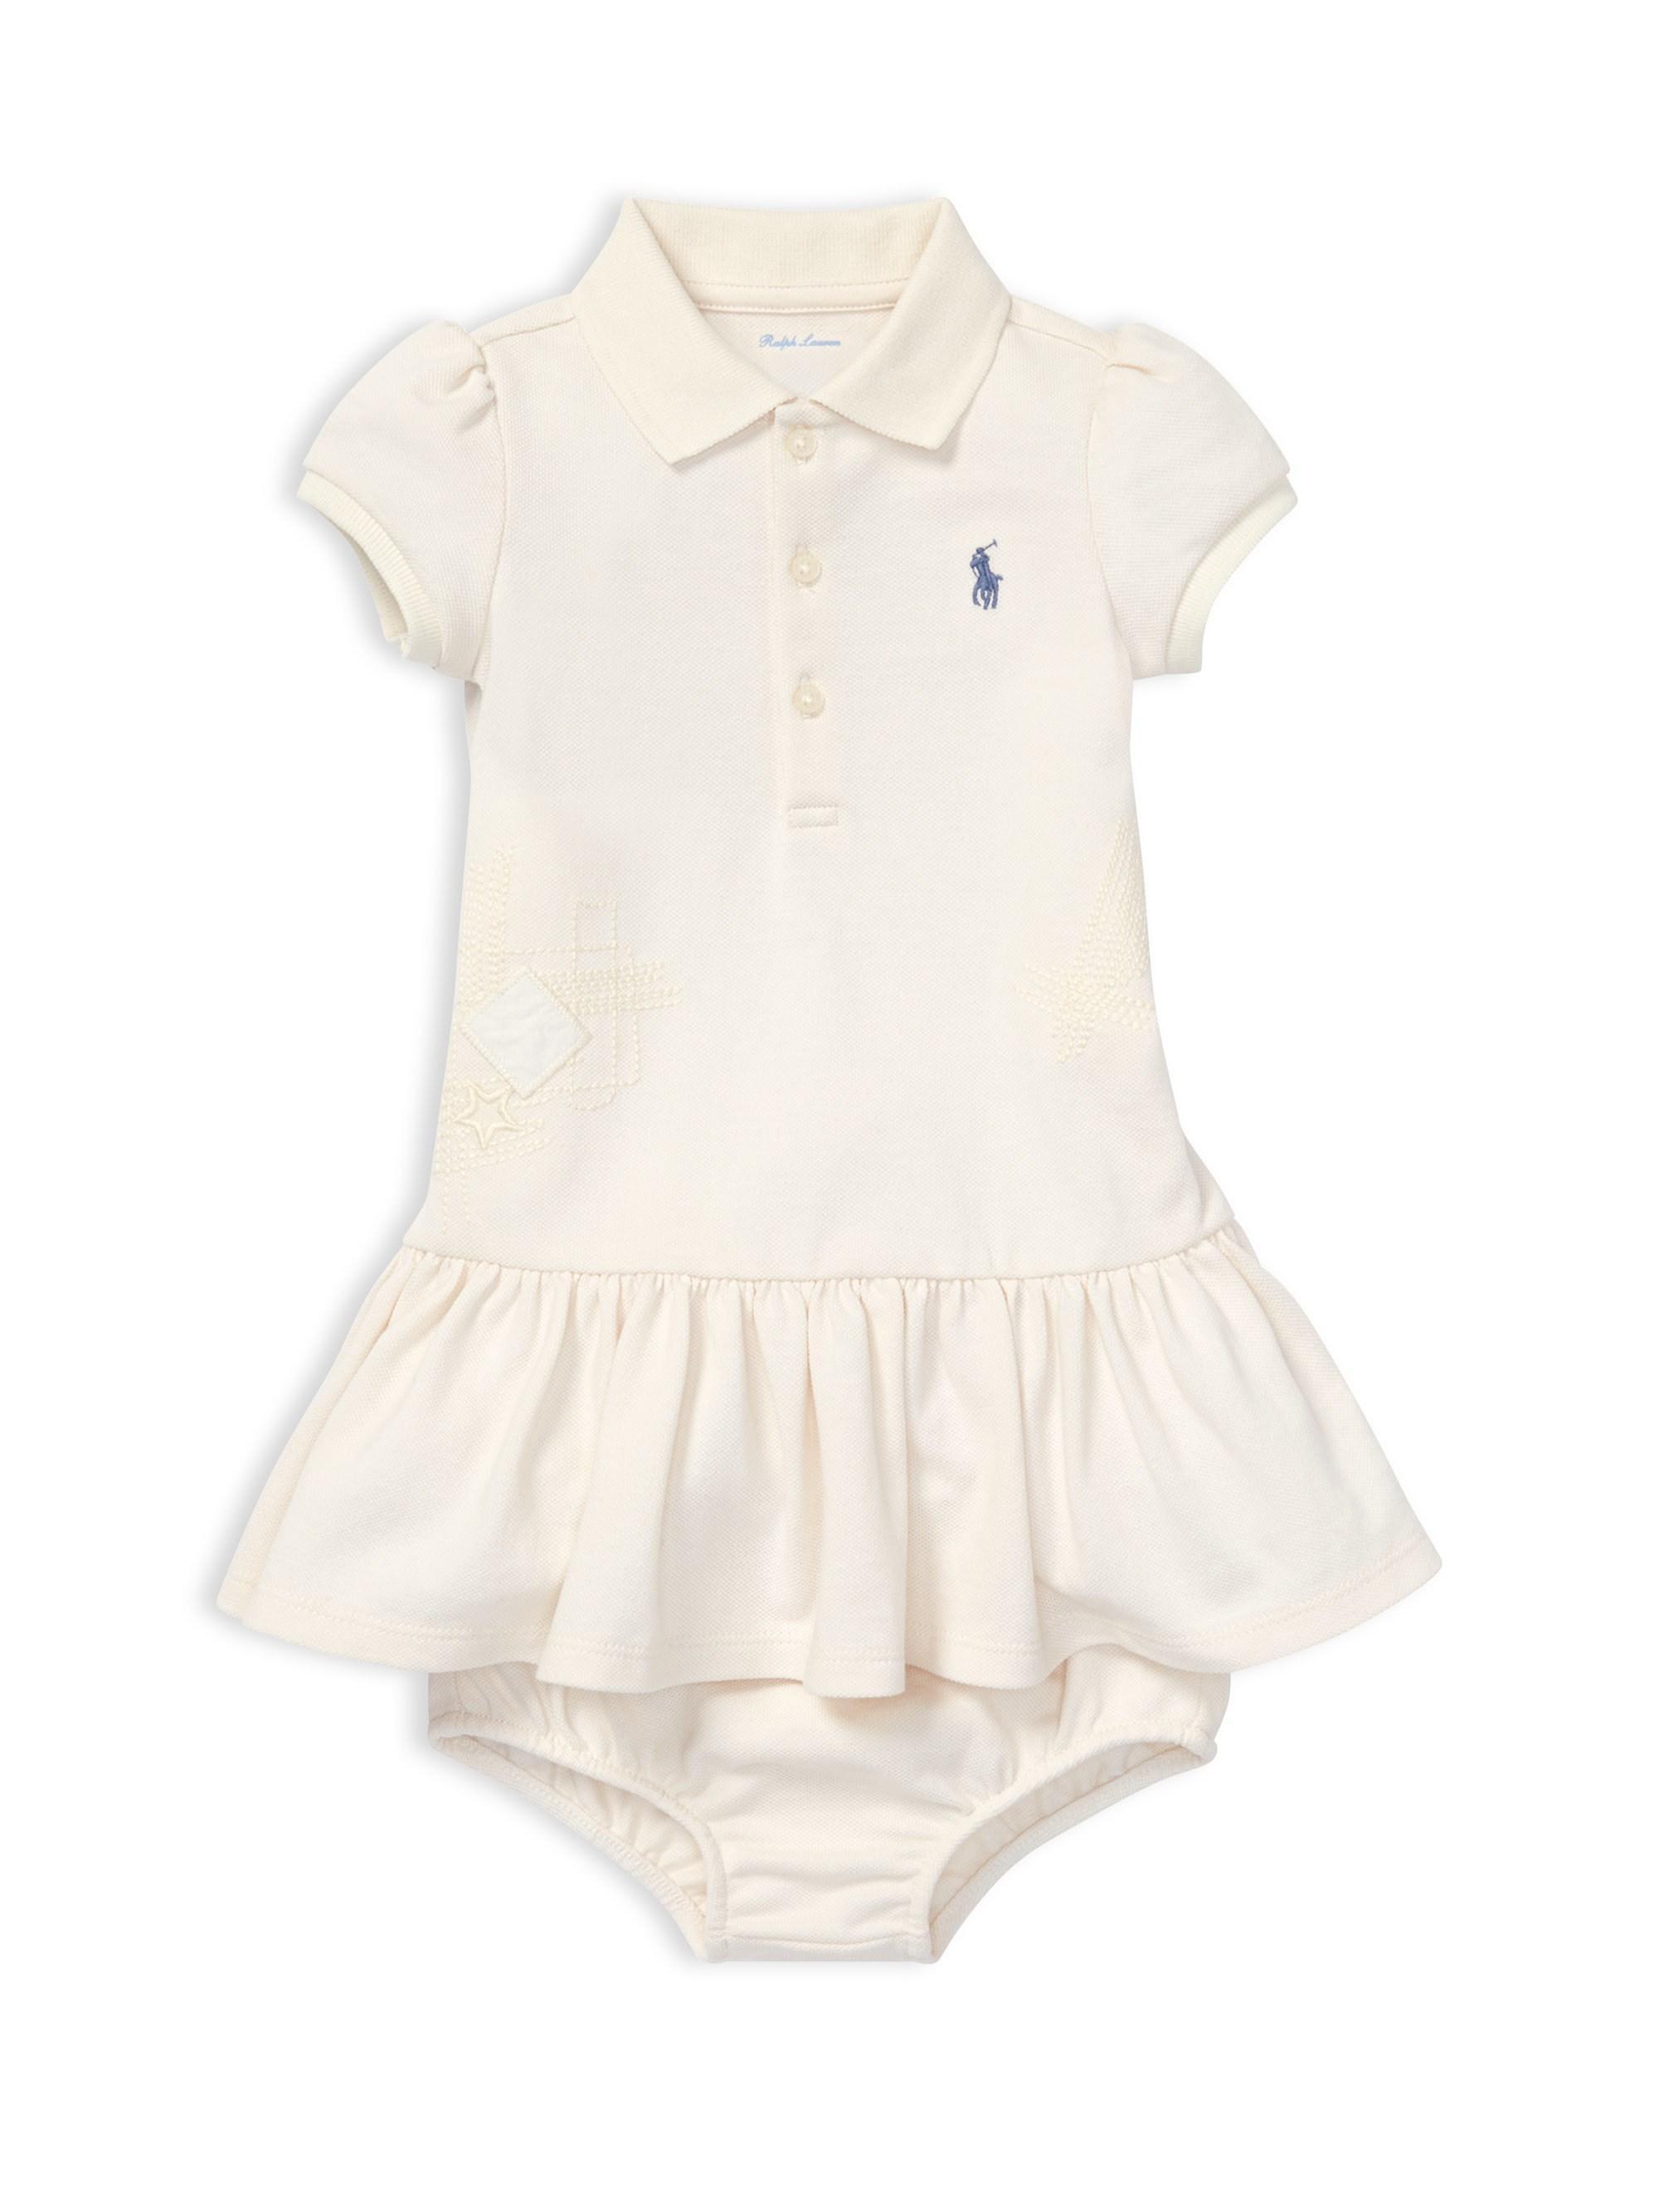 6cb8ac06c Lyst - Ralph Lauren Baby Girl s 2-piece Cotton Polo Dress   Bloomers ...